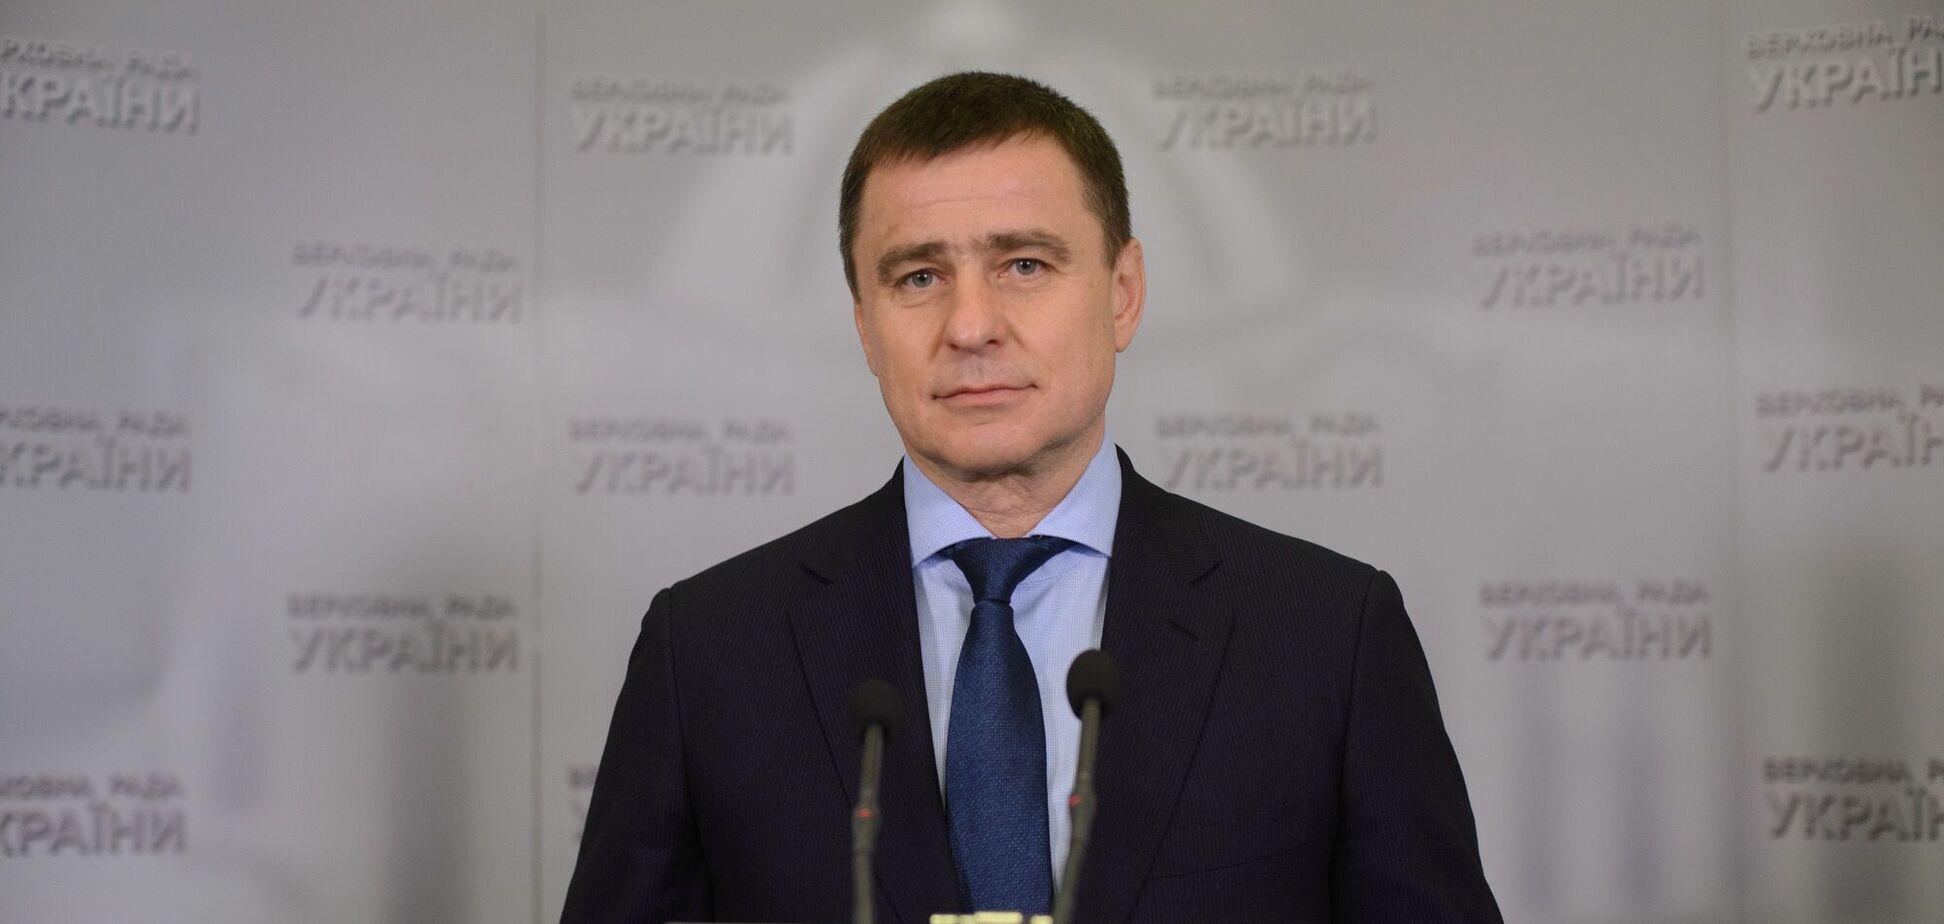 Нардеп Дмитрий Шенцев